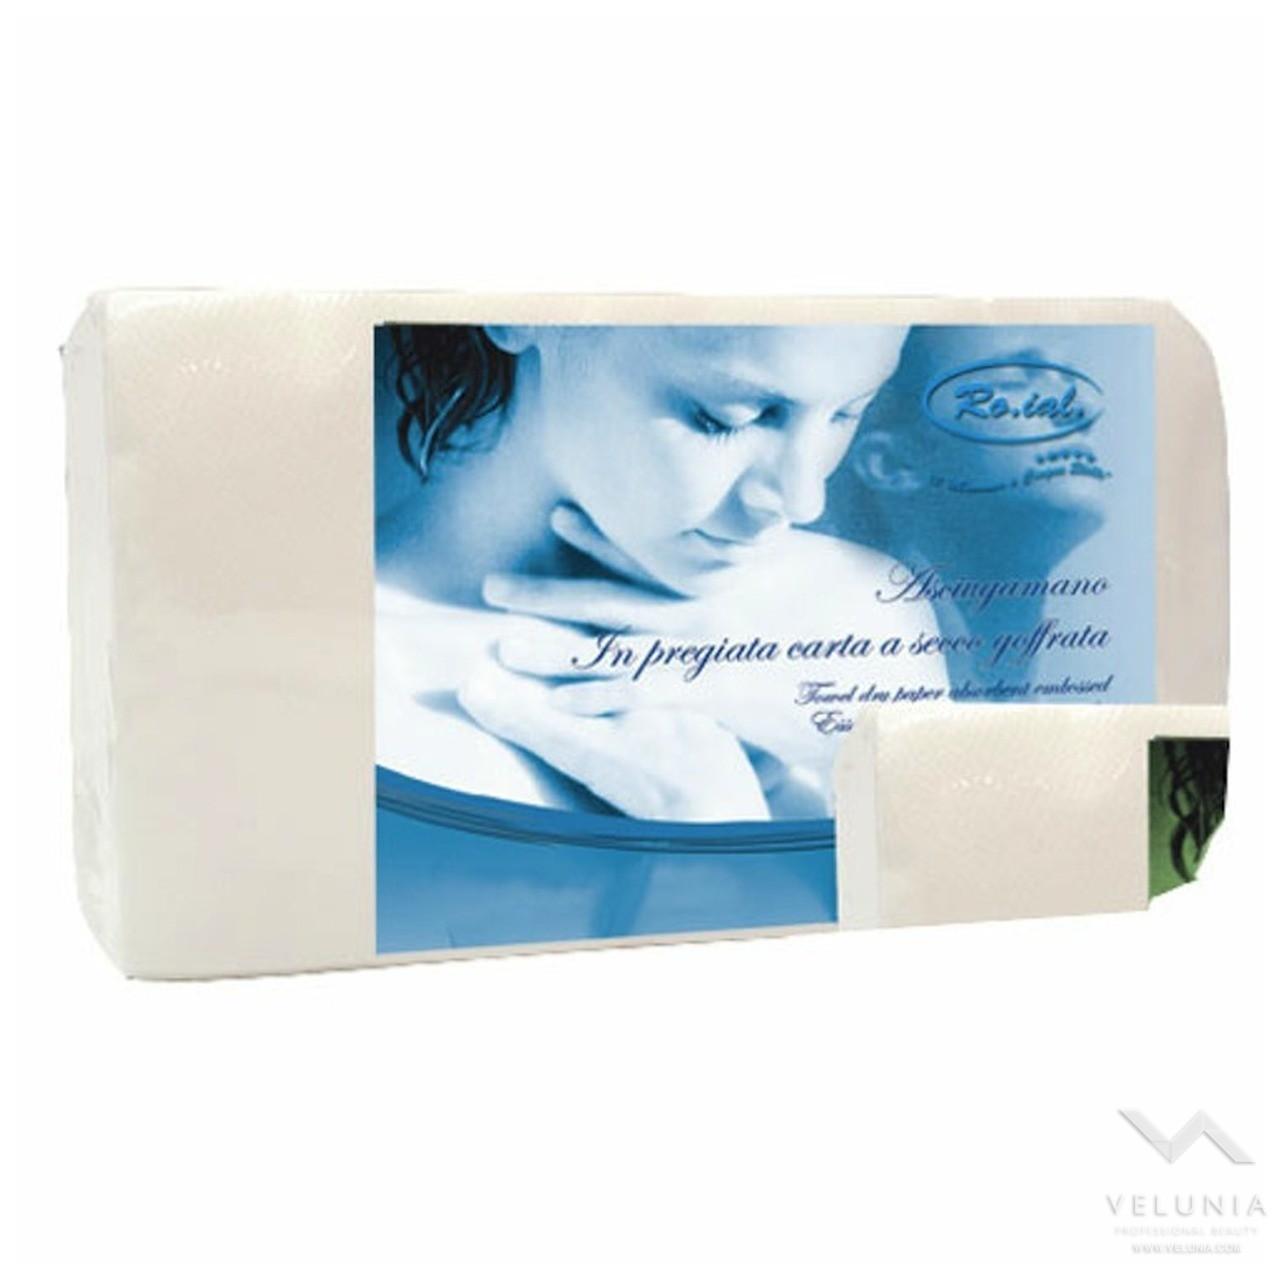 Asciugamano carta Ro.ial 1